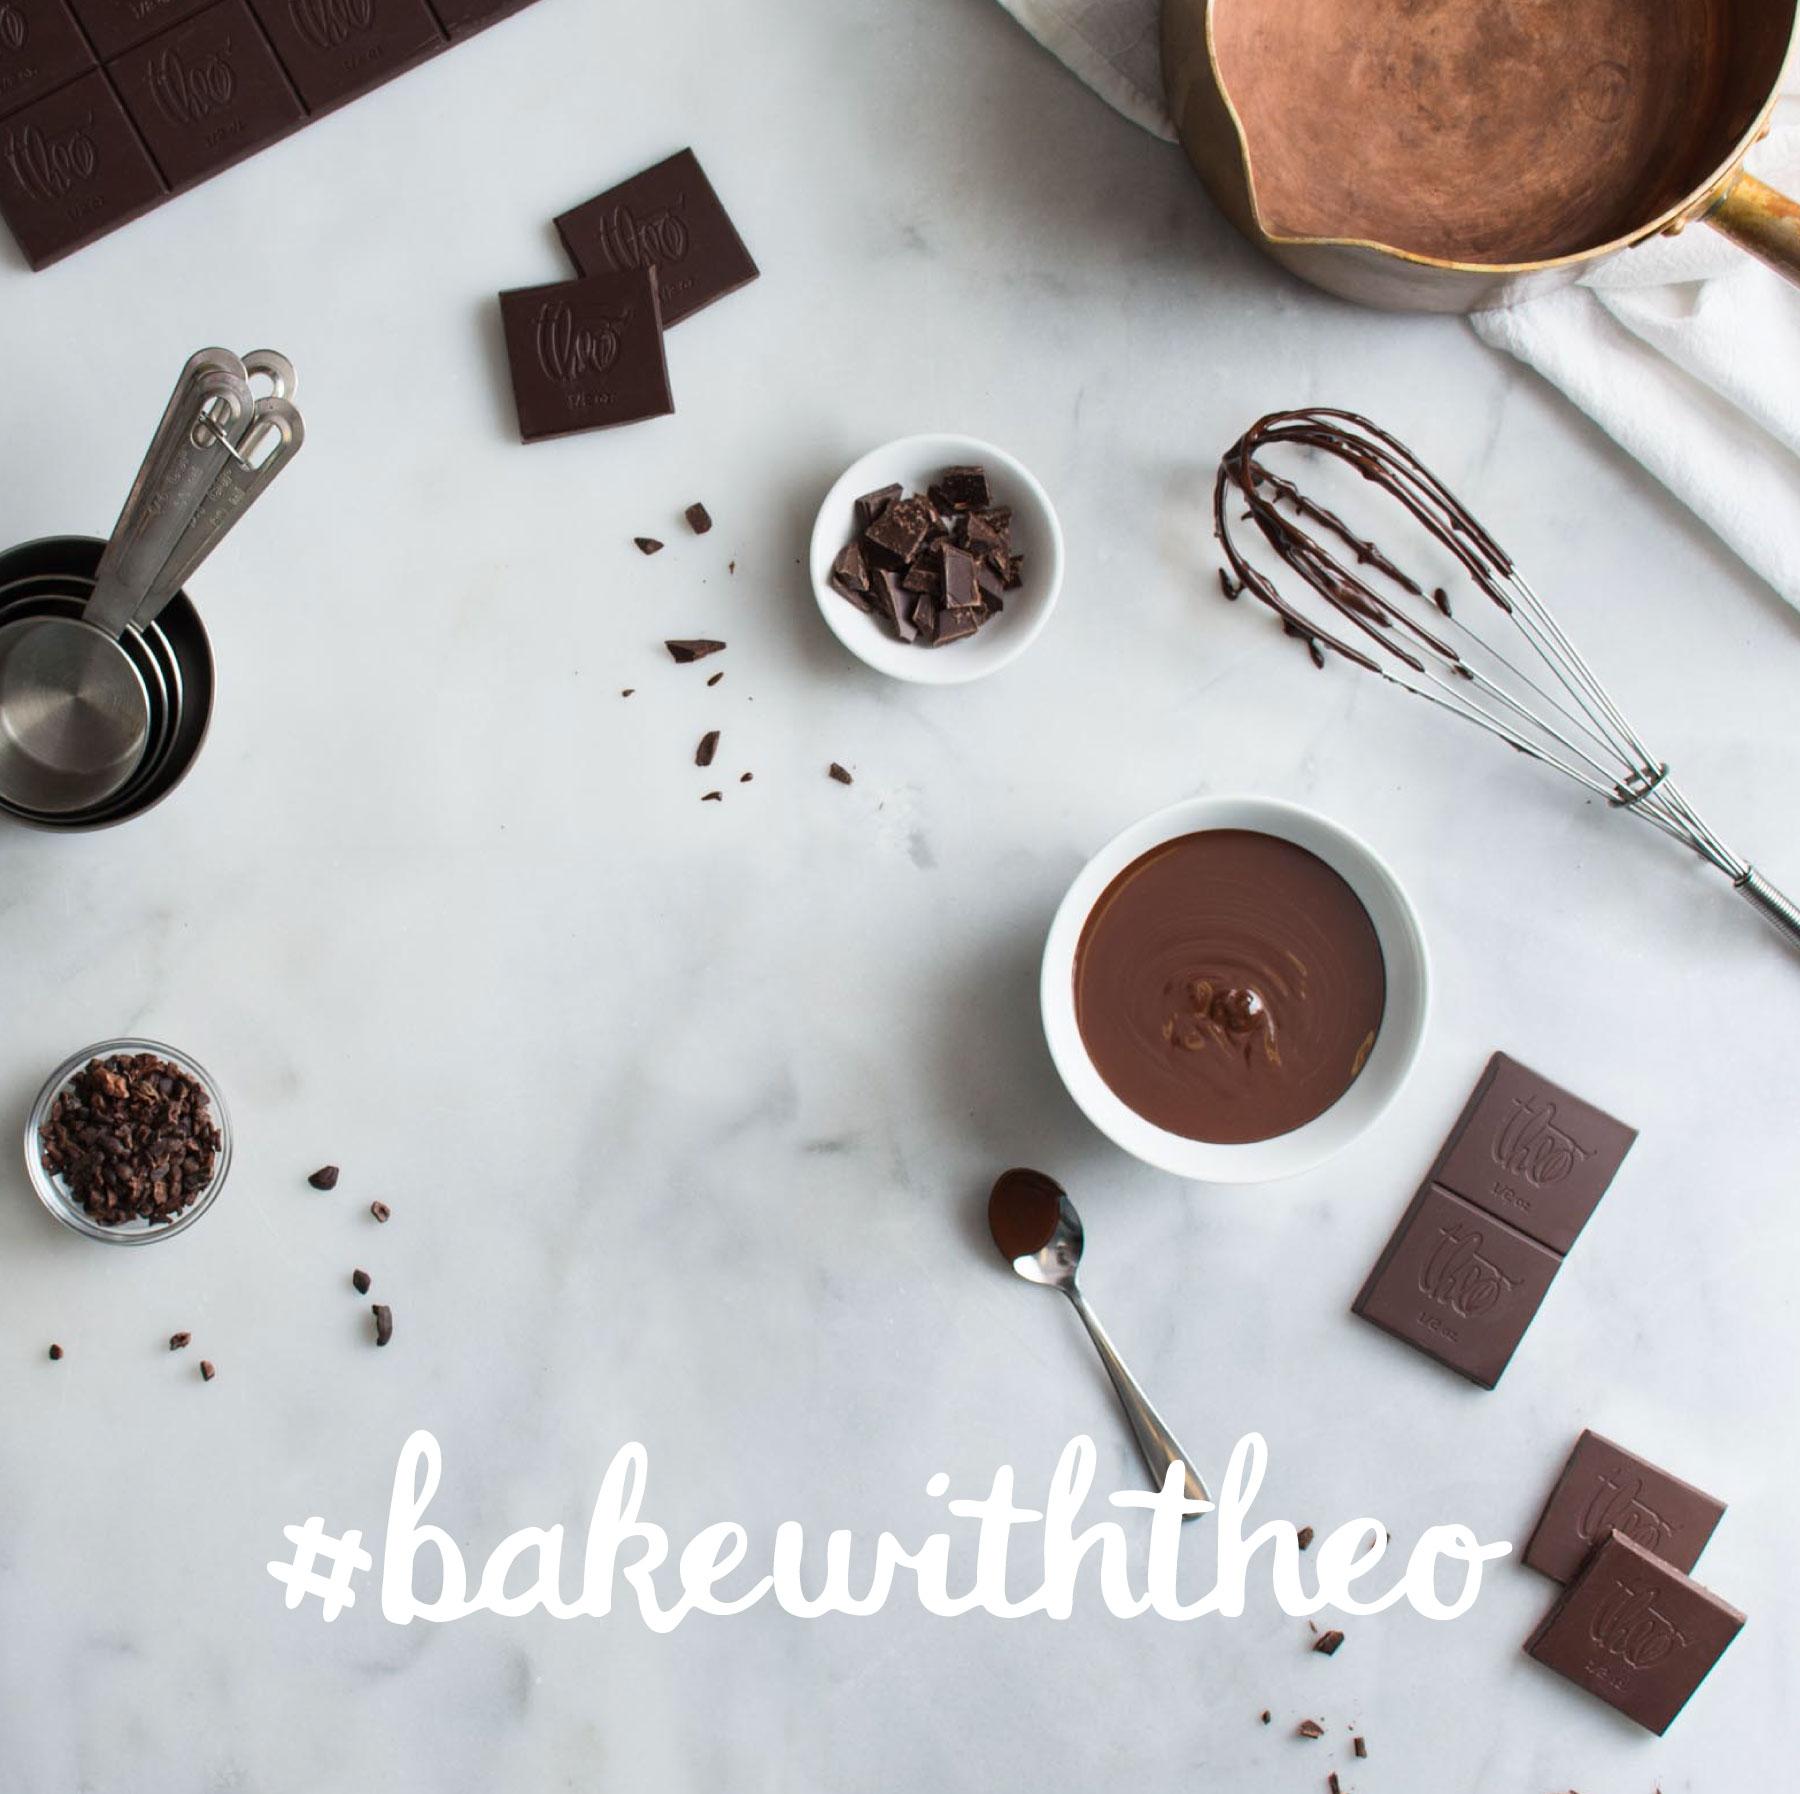 Bake-with-Theo.jpg